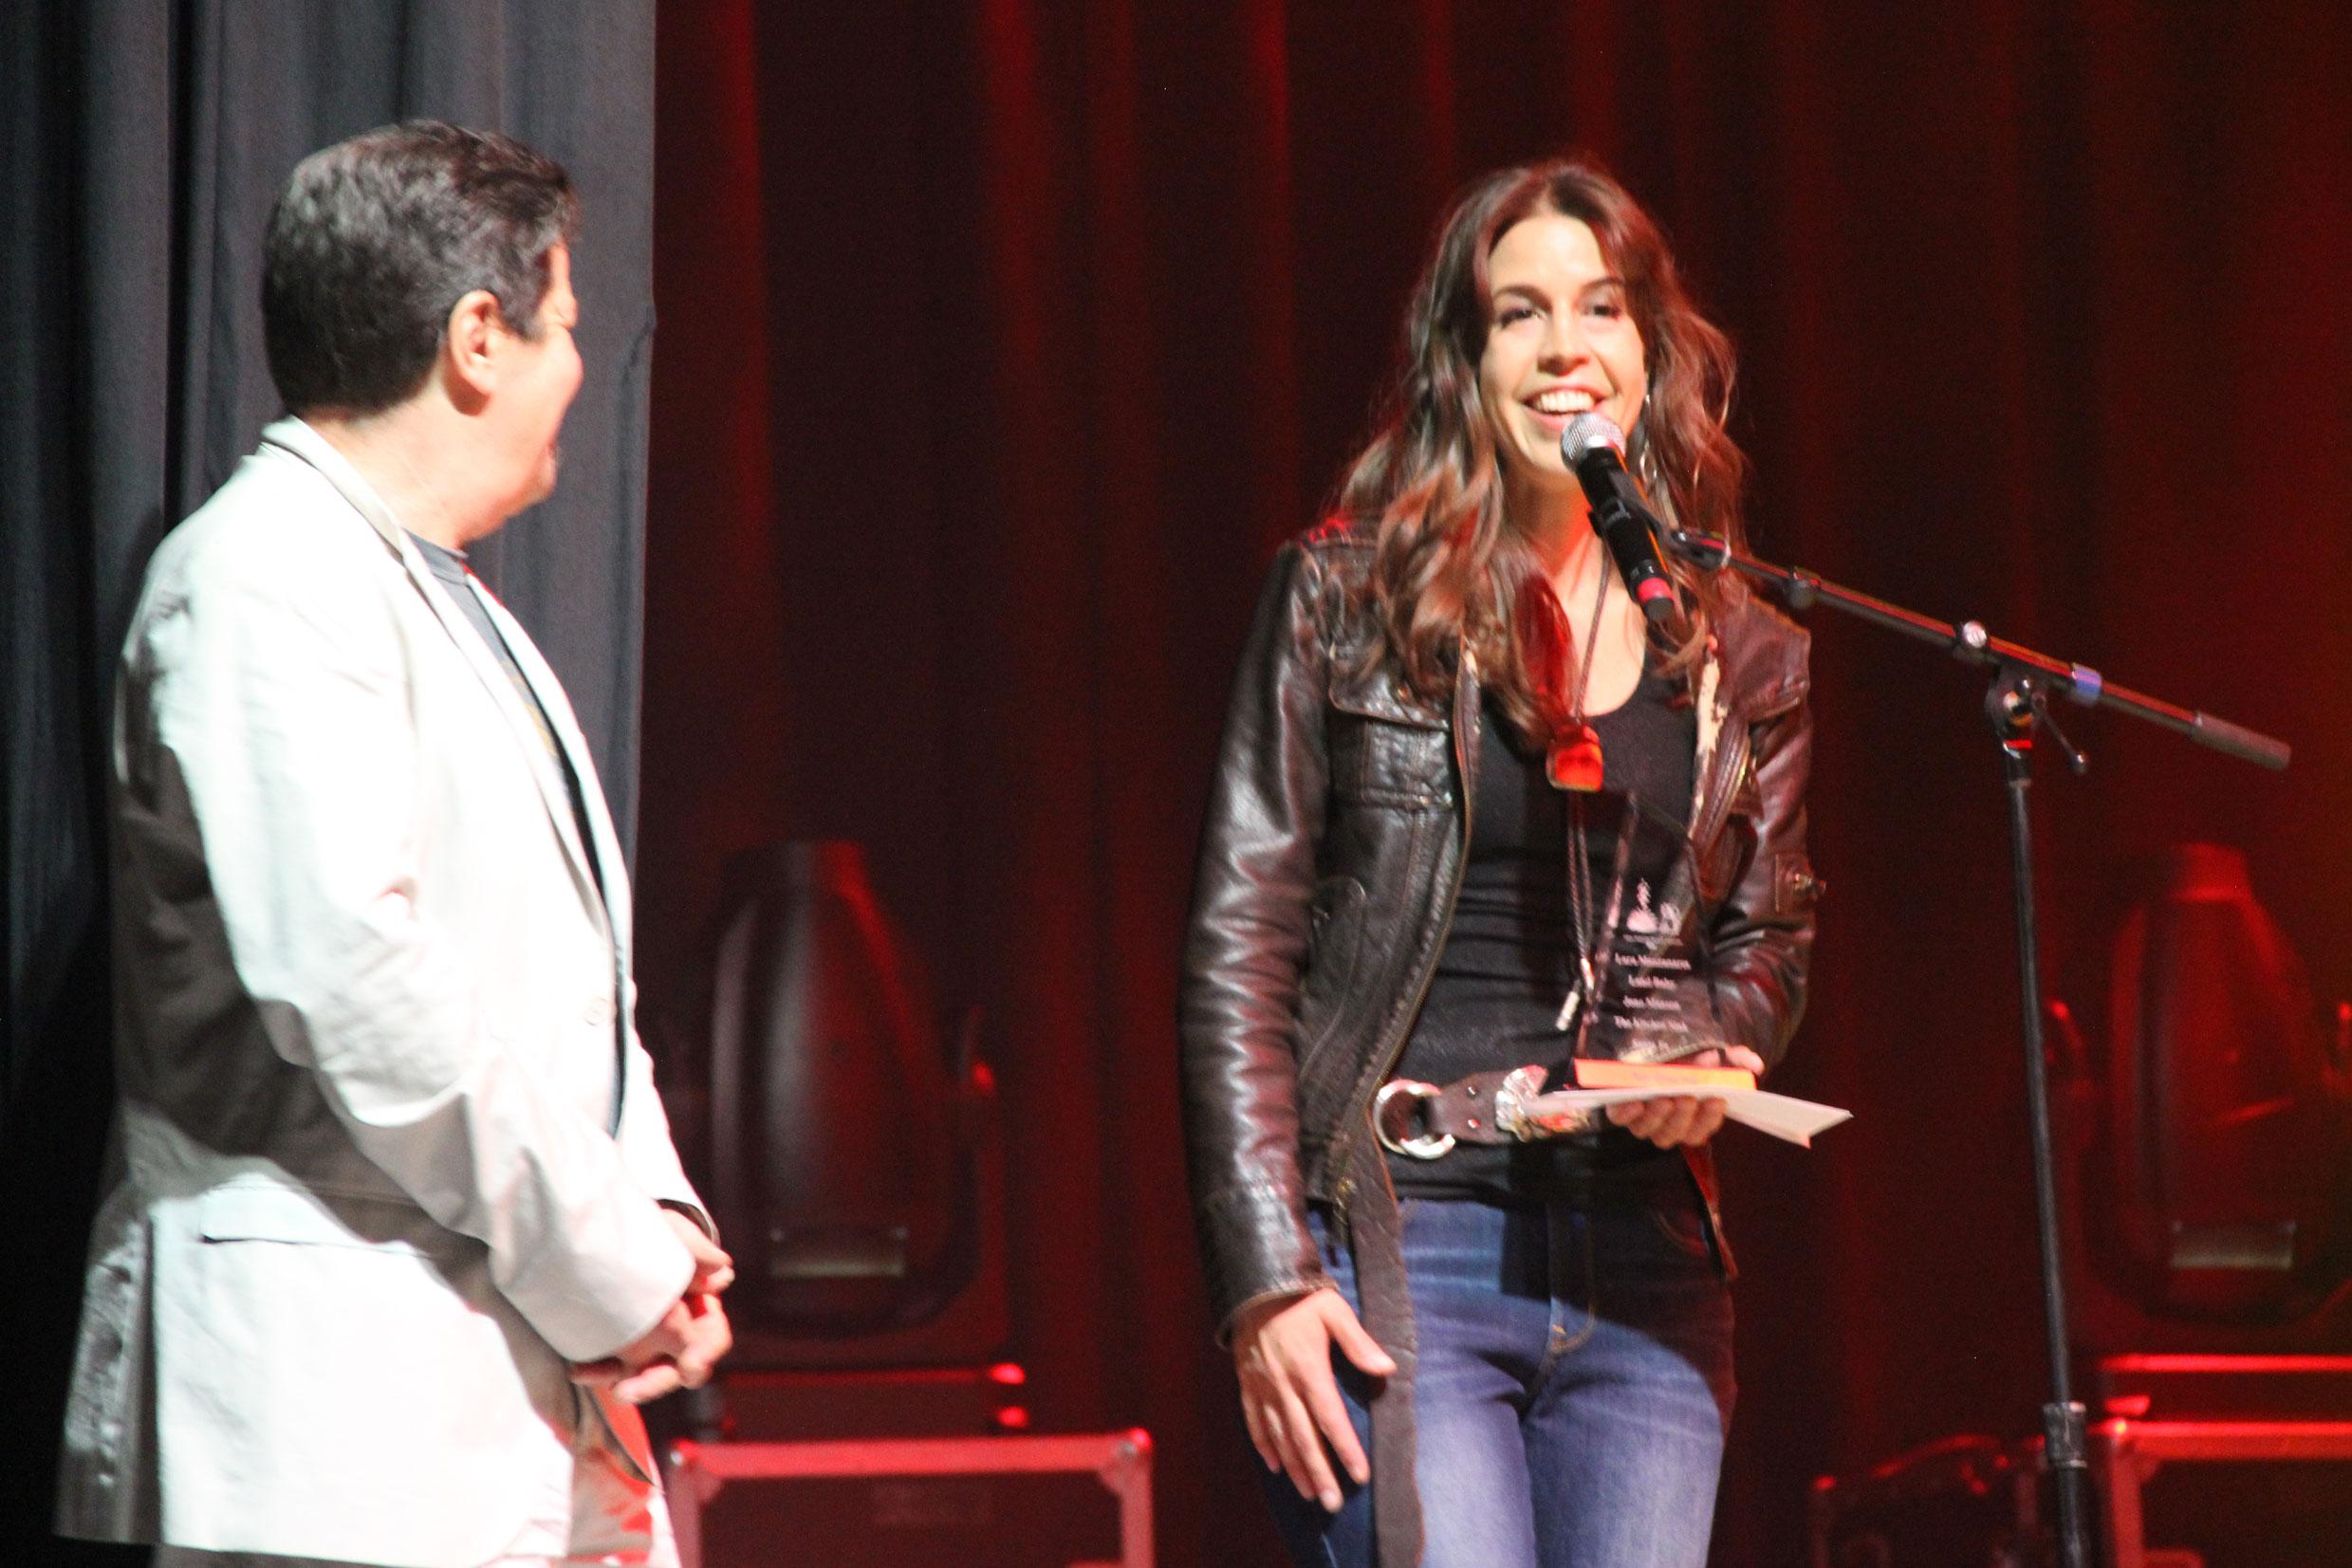 Lara_Receiving_Award.jpg